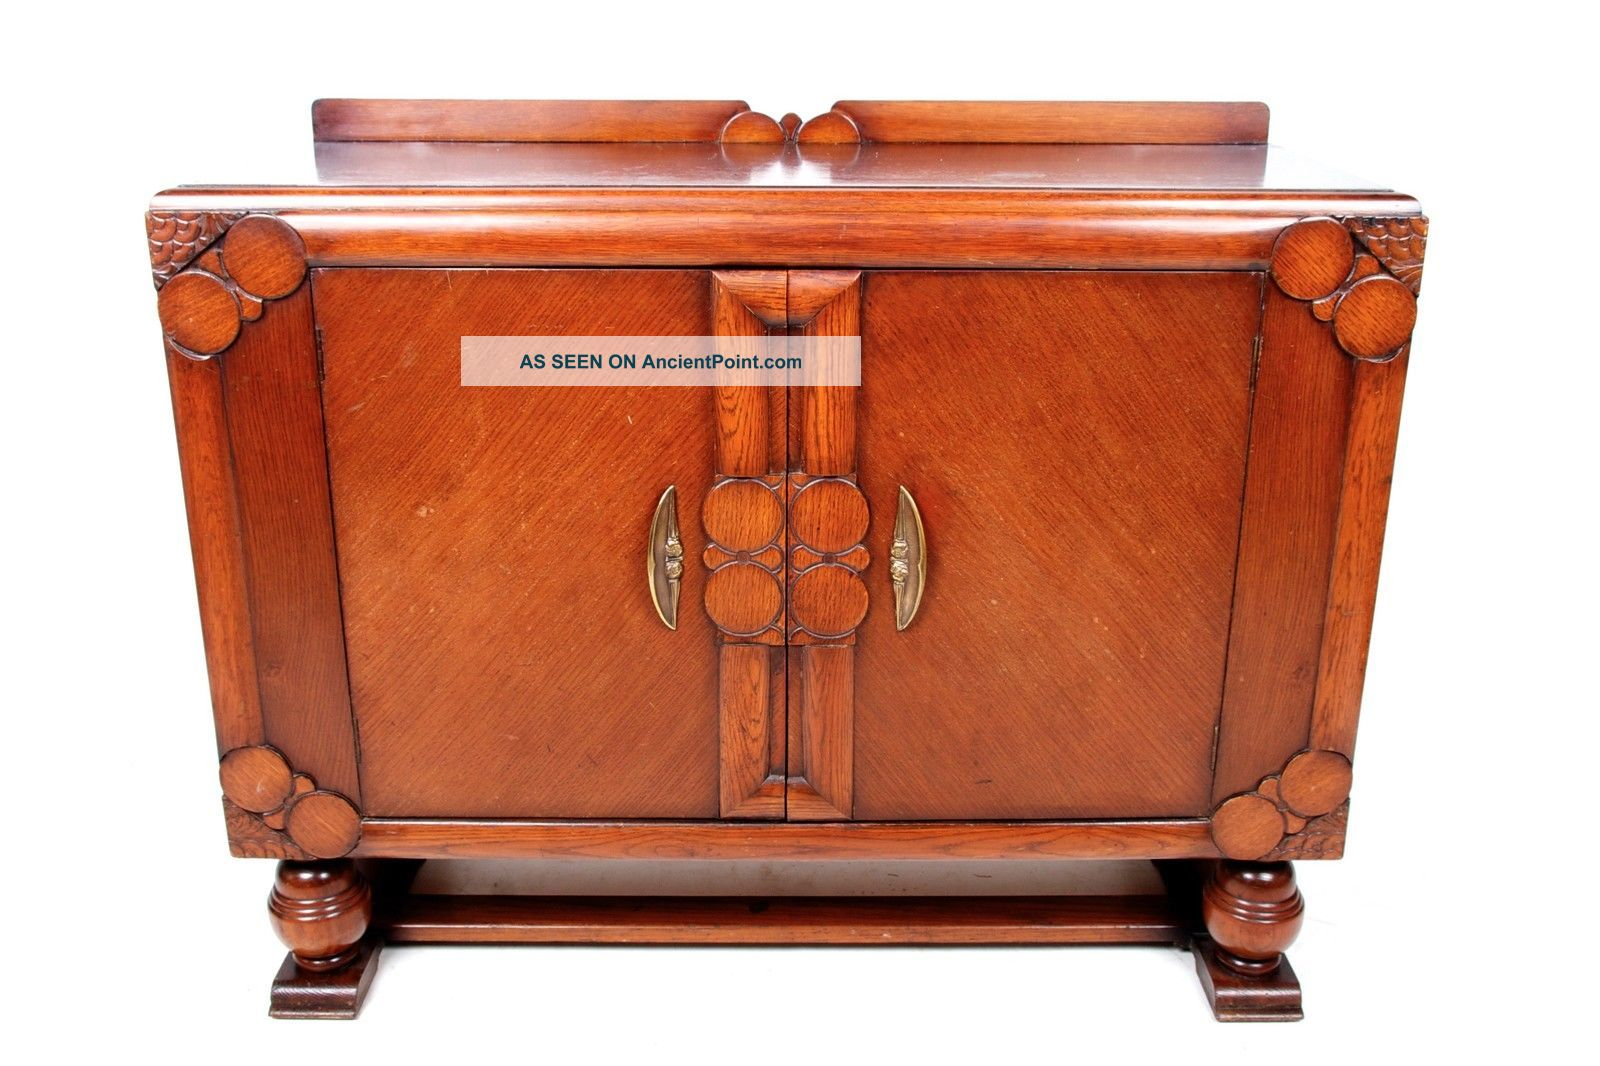 Vintage Oak Sideboard Credenza Buffet Art Deco Jacobean Revival 1930s 40s 1900-1950 photo